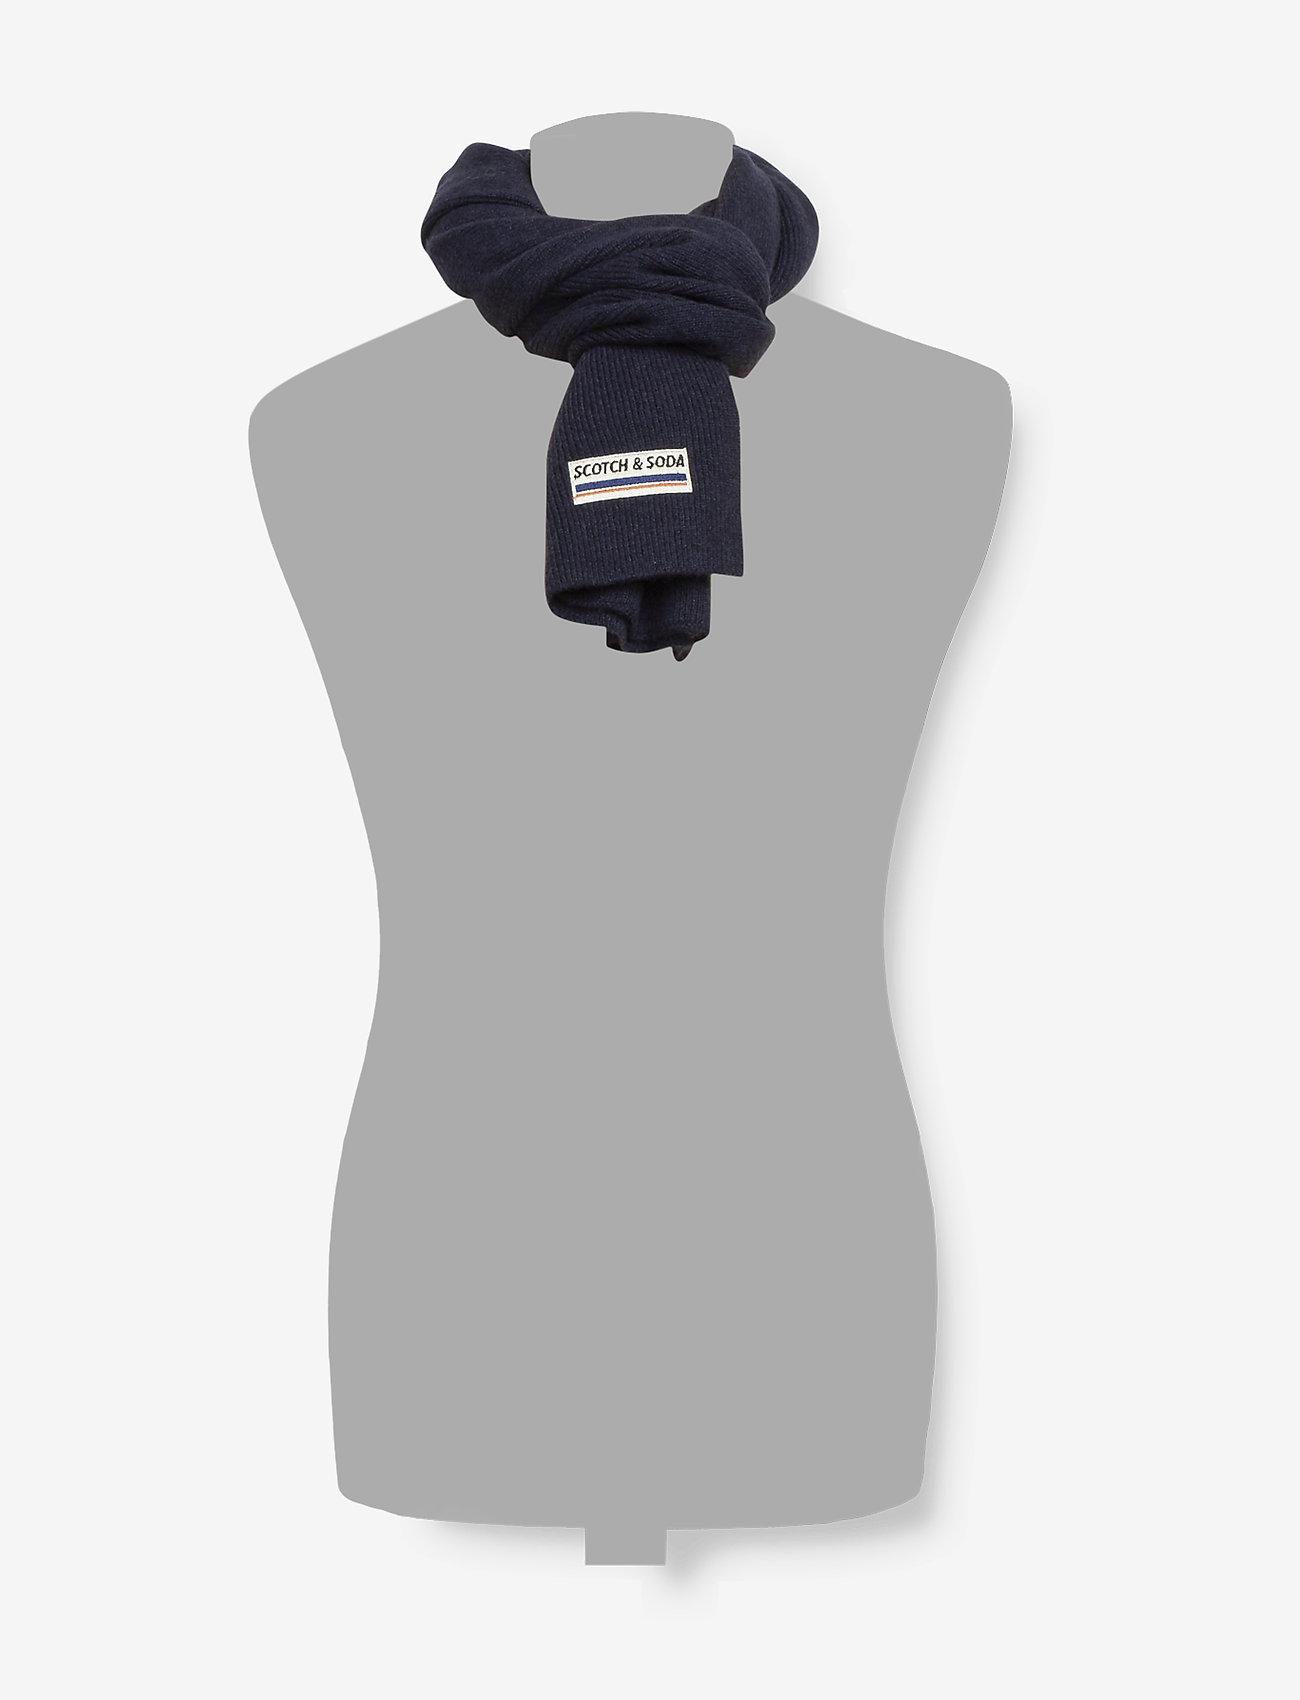 Scotch & Soda - Classic rib knit scarf in soft wool-blend quality - scarves - night - 1